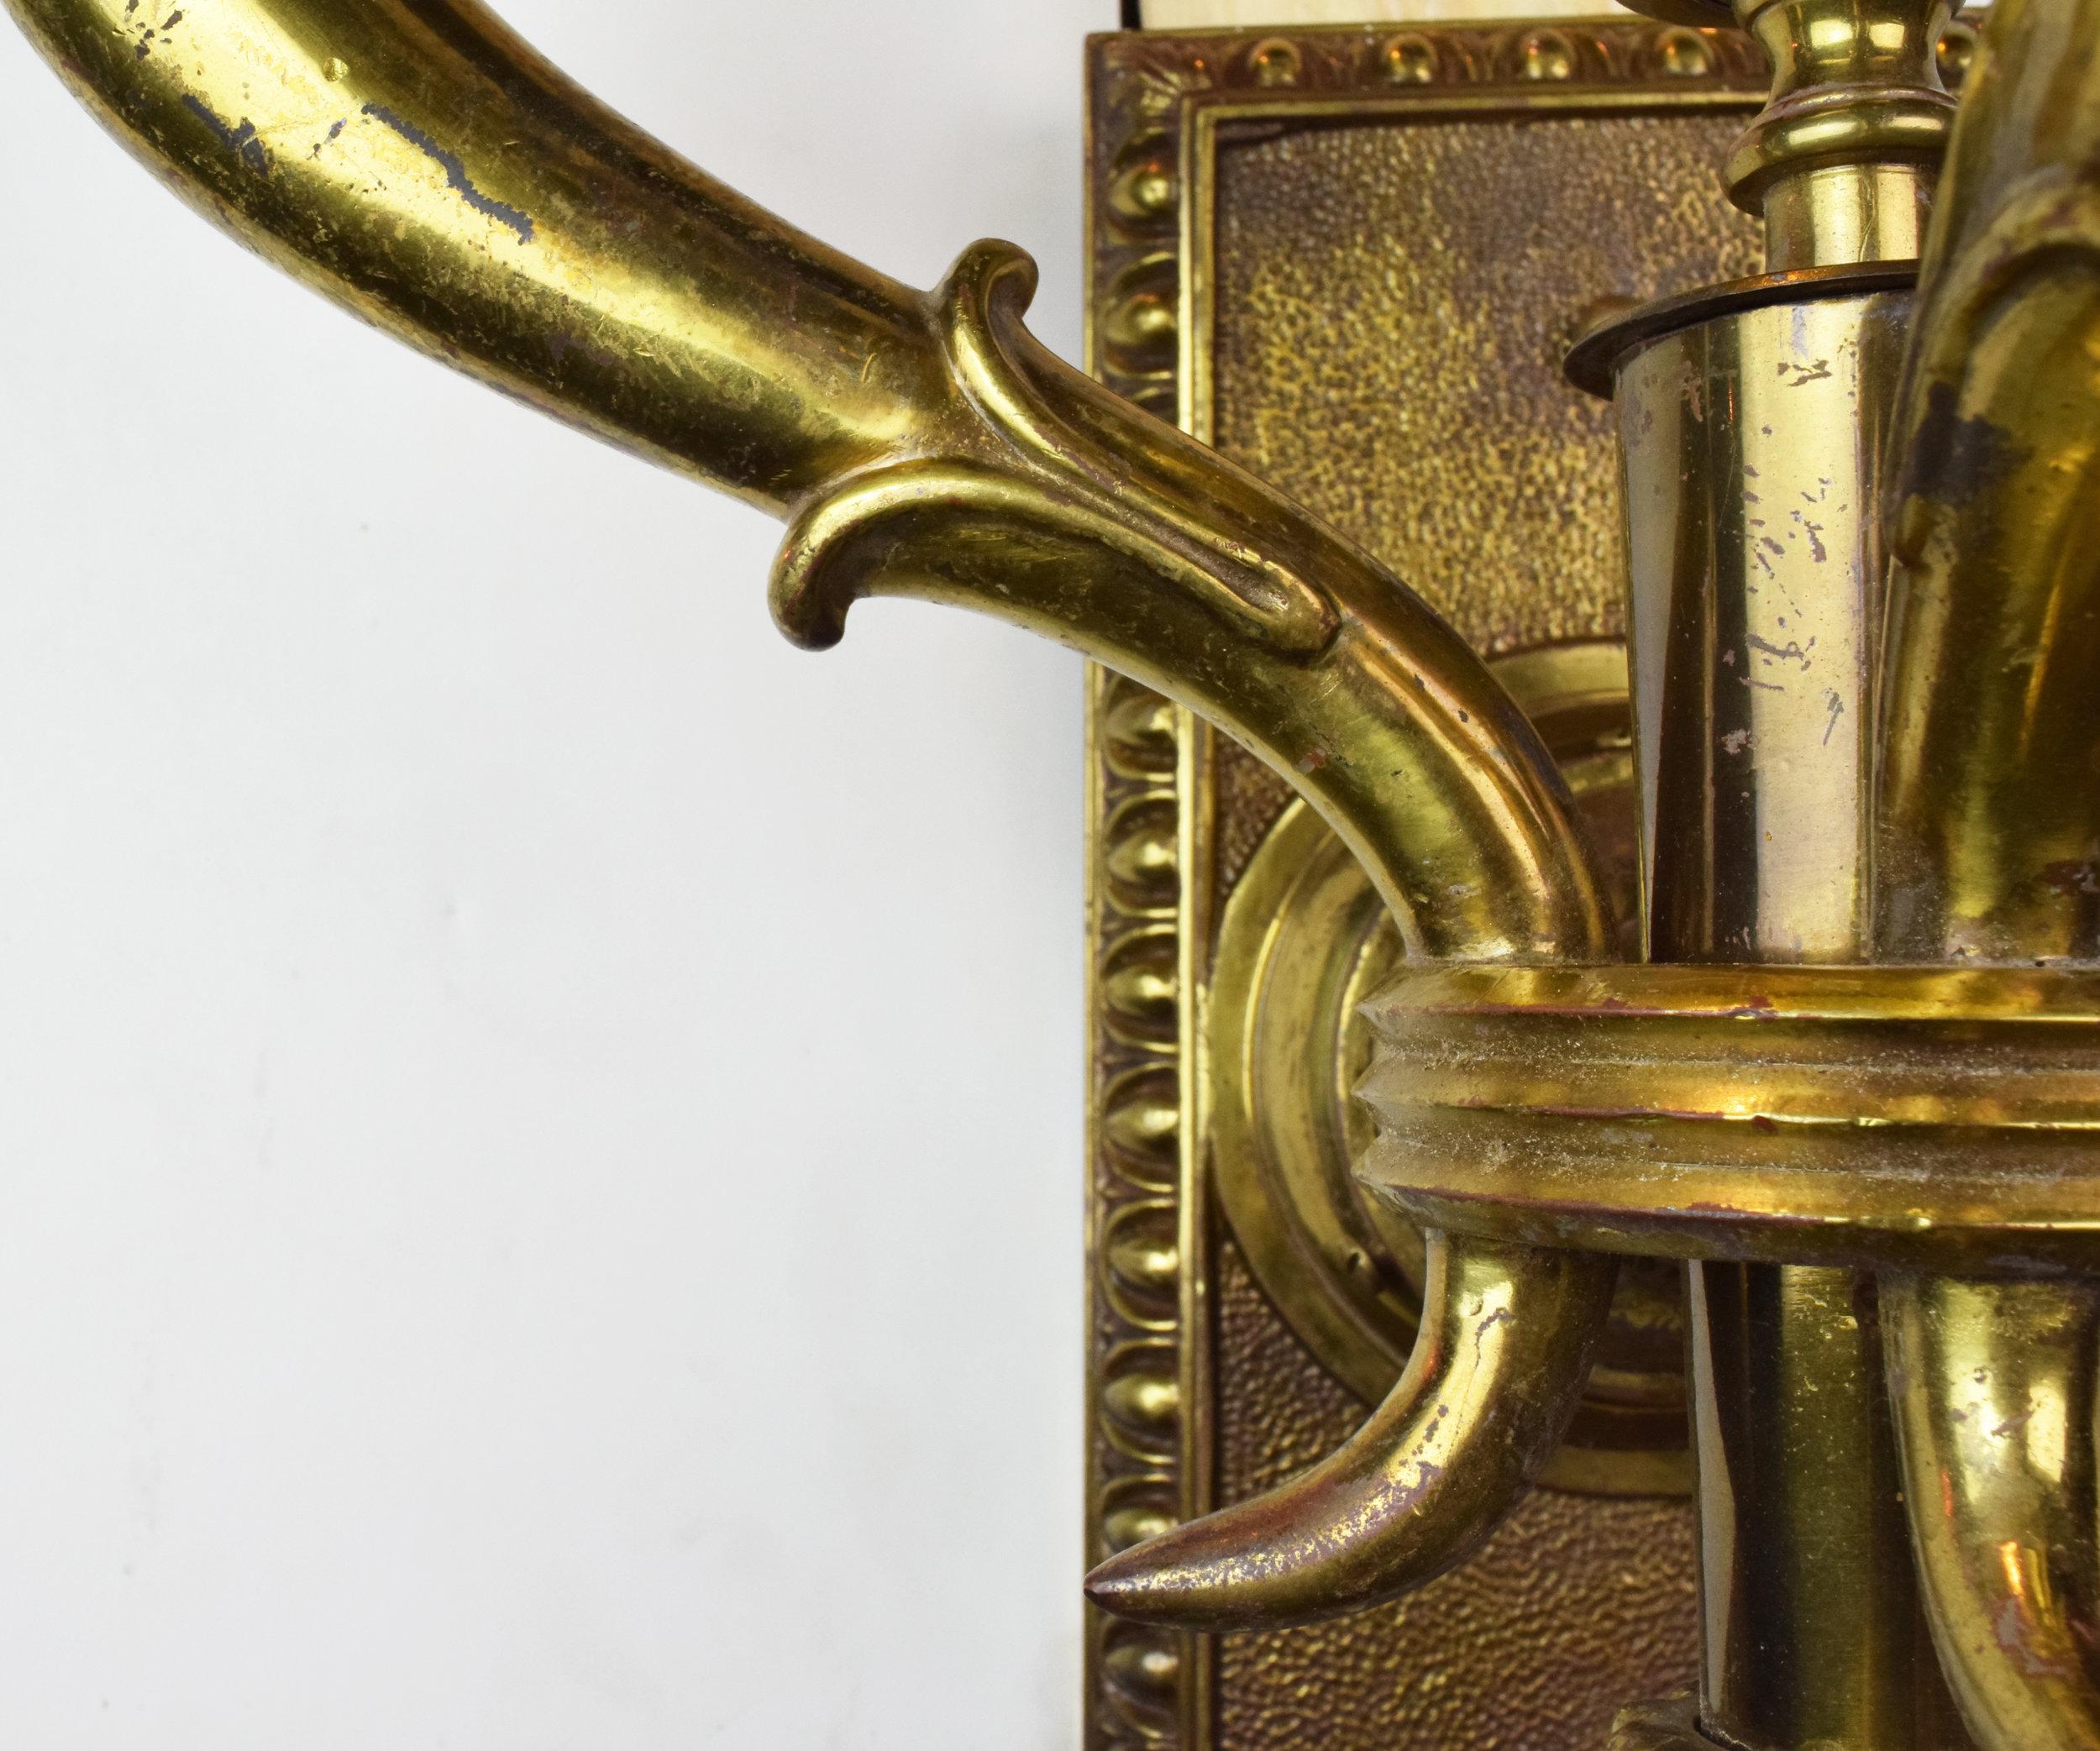 47172-brass-3-arm-ED-sconce-detail-arm-2.JPG